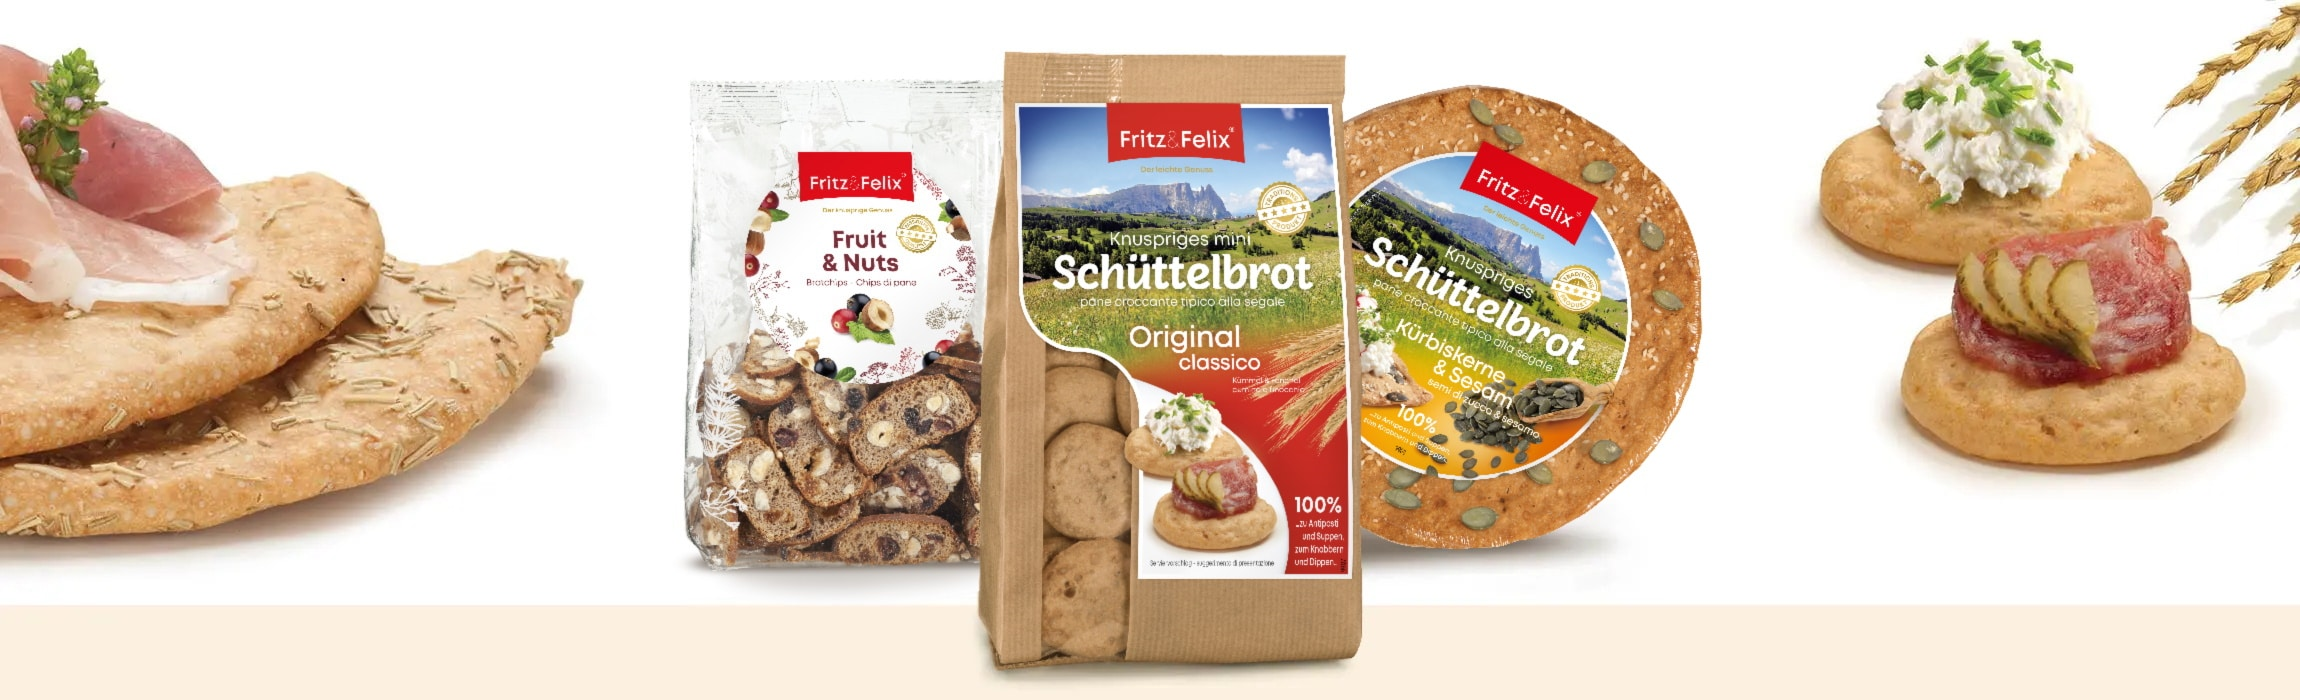 Fritz und Felix Produktsortiment